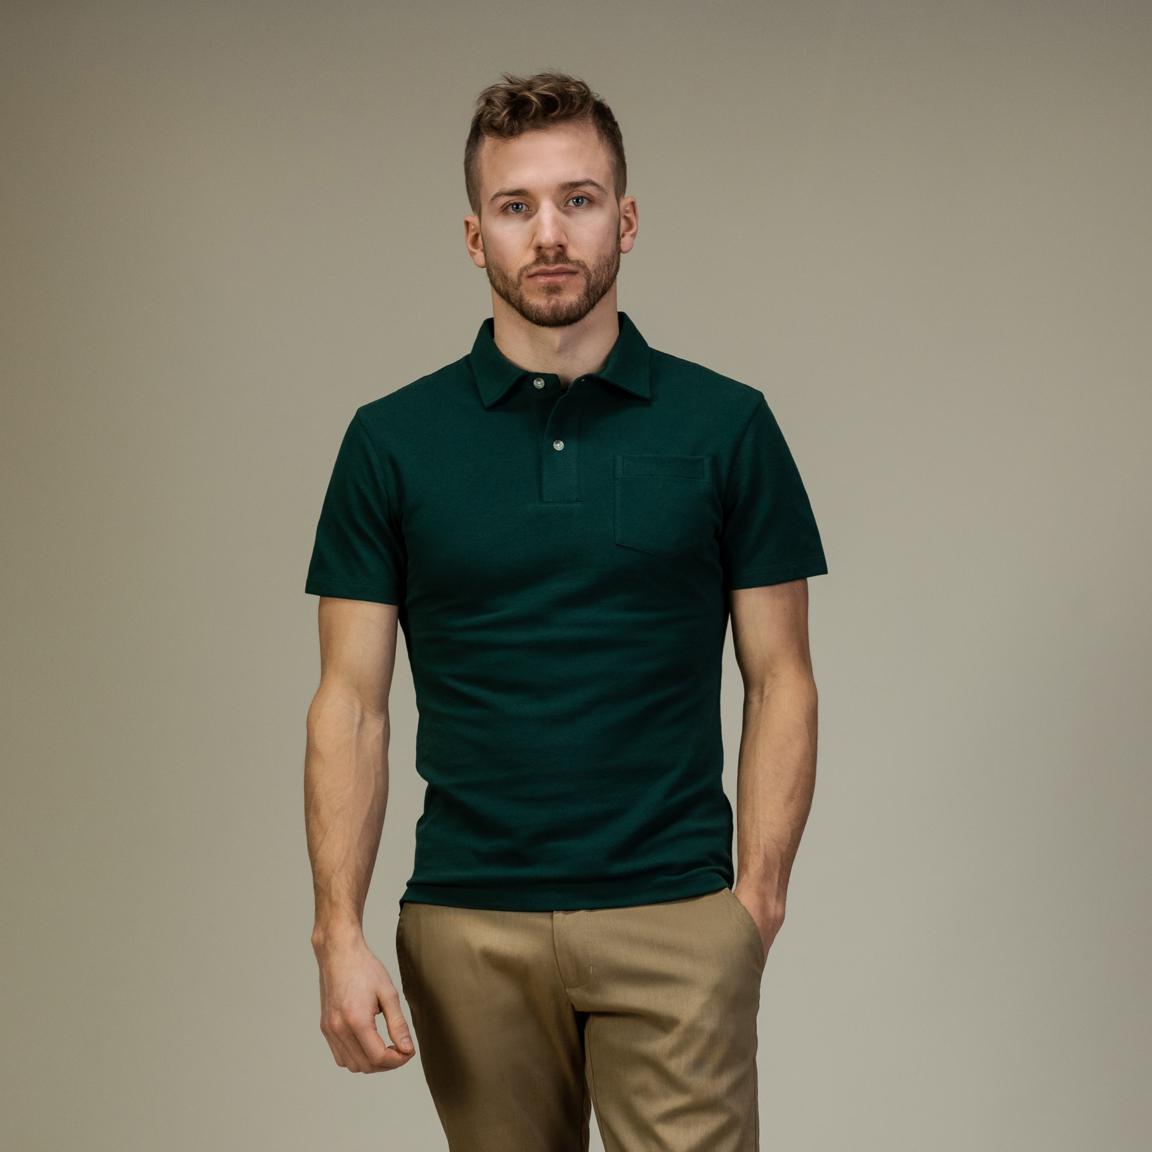 Smaragdgrøn kortærmet polo-skjorte